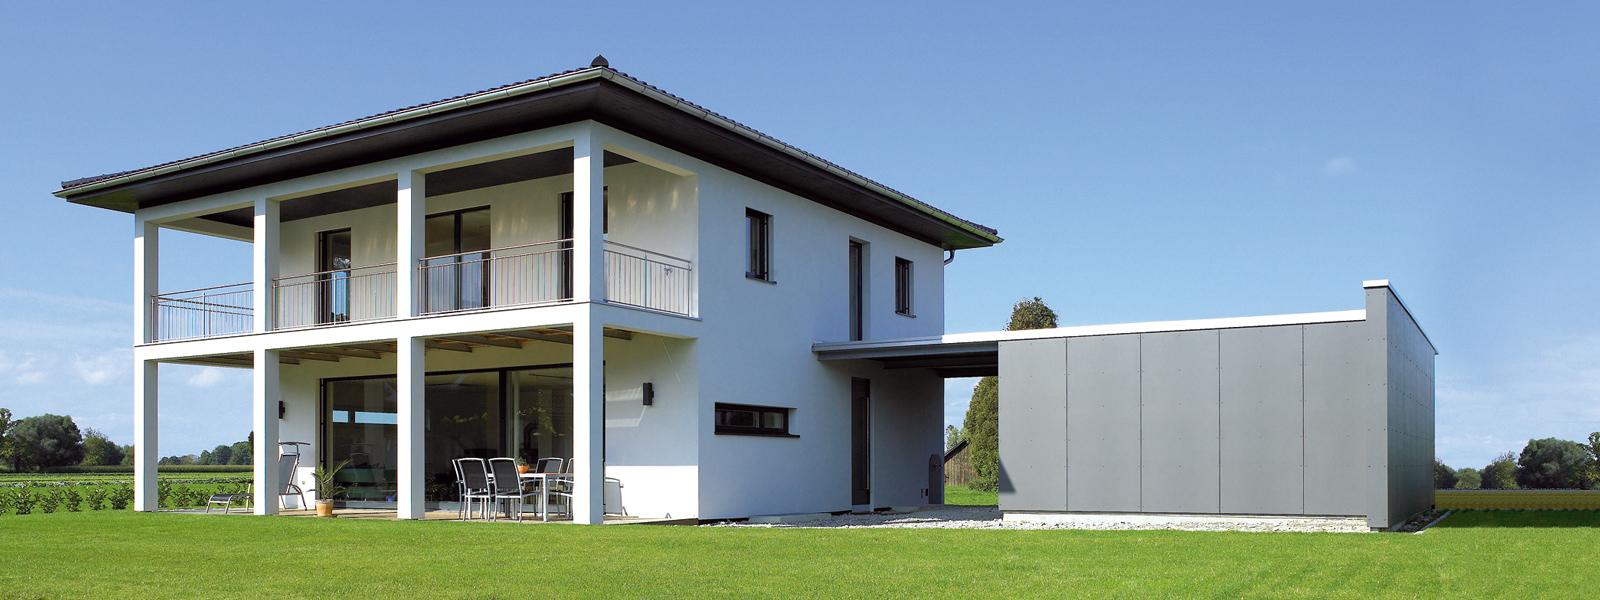 alpina_home_projektslider07_blum